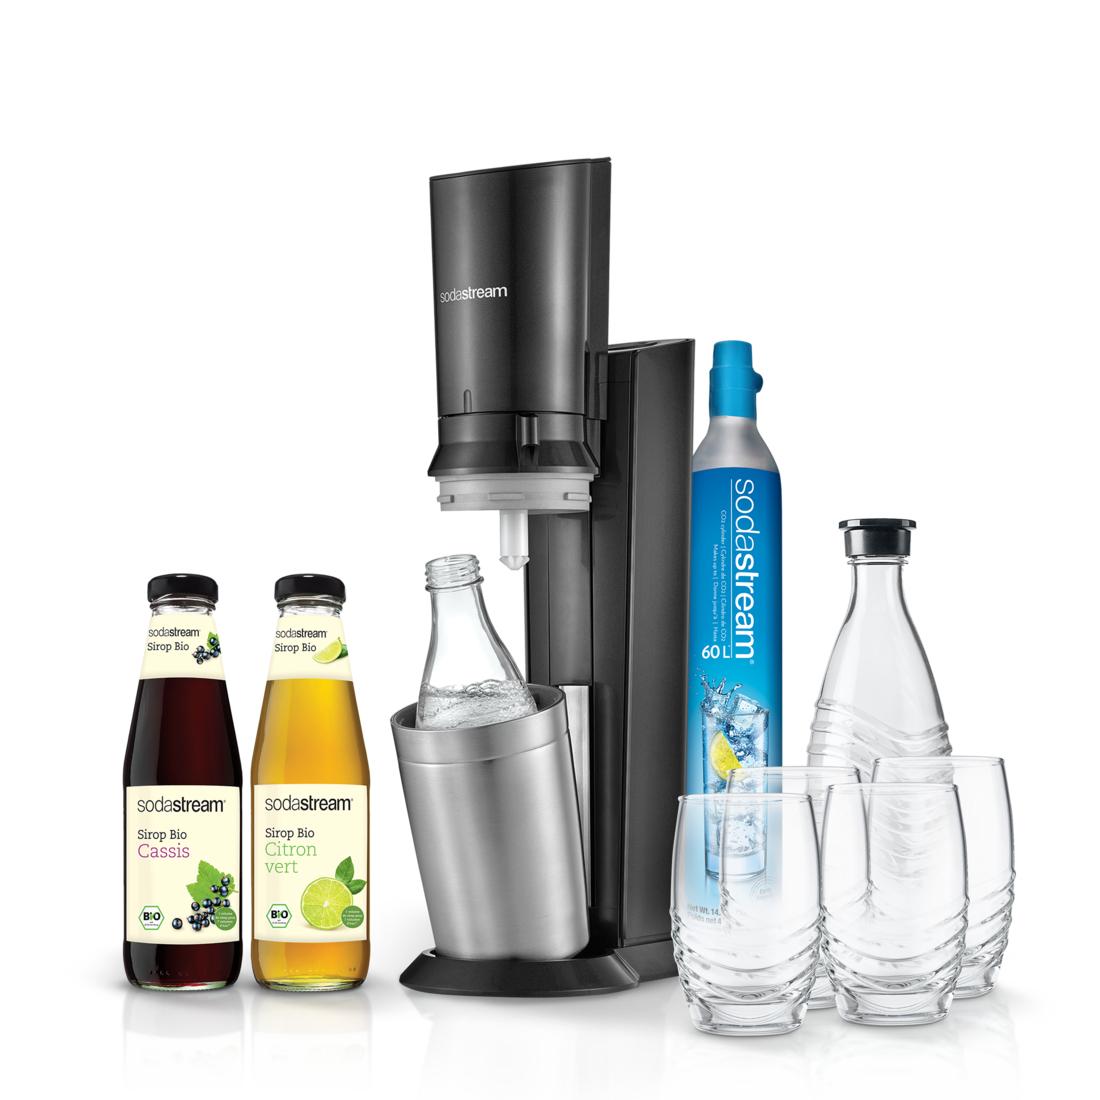 Pack Machine à gazéifier Sodastream Crystal + 4 Verres + 2 Carafes + 2 Sirops + Bonus fête des mères